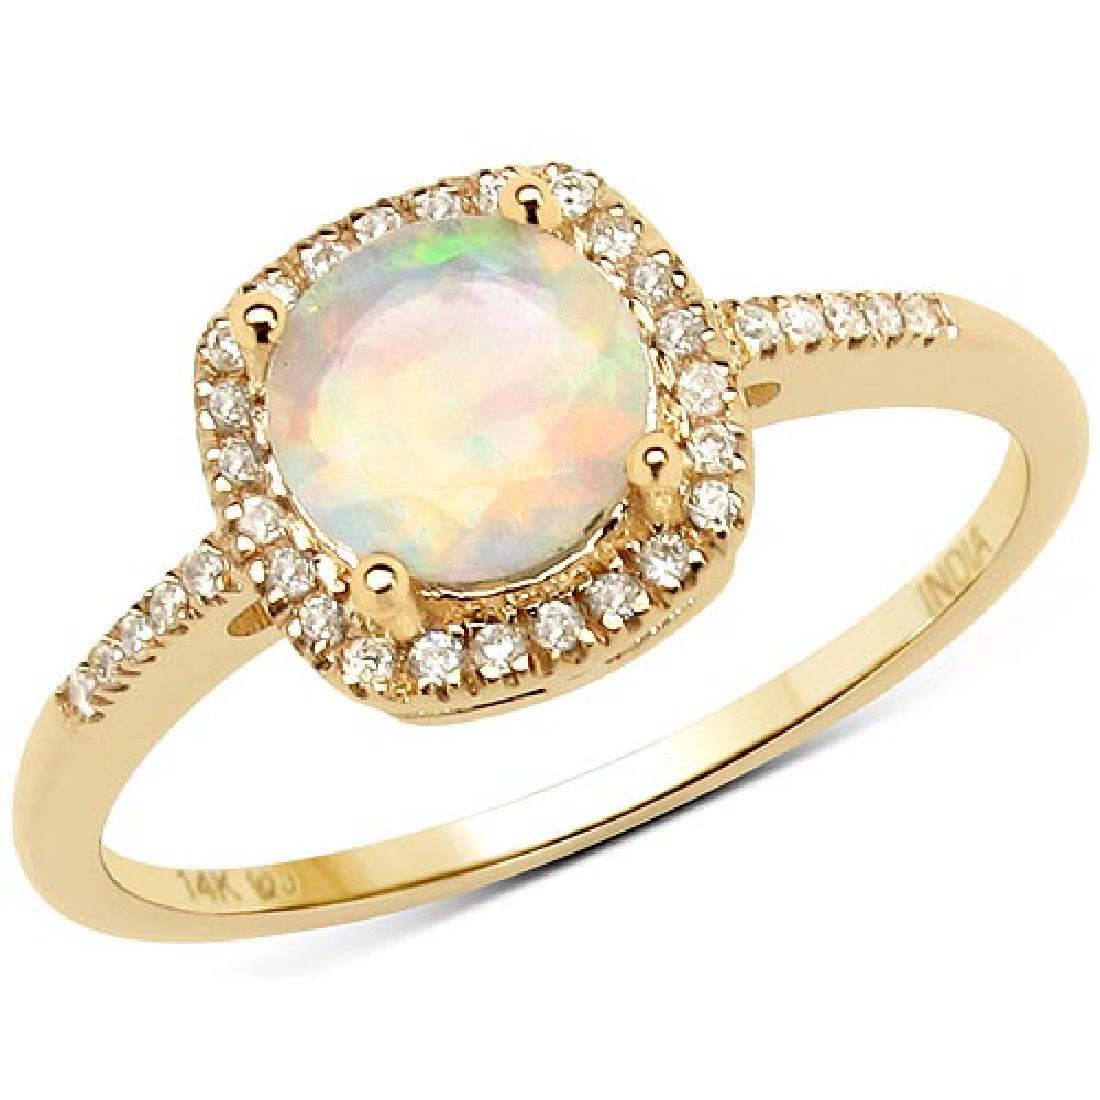 0.60 Carat Genuine Ethiopian Opal and White Diamond 14K